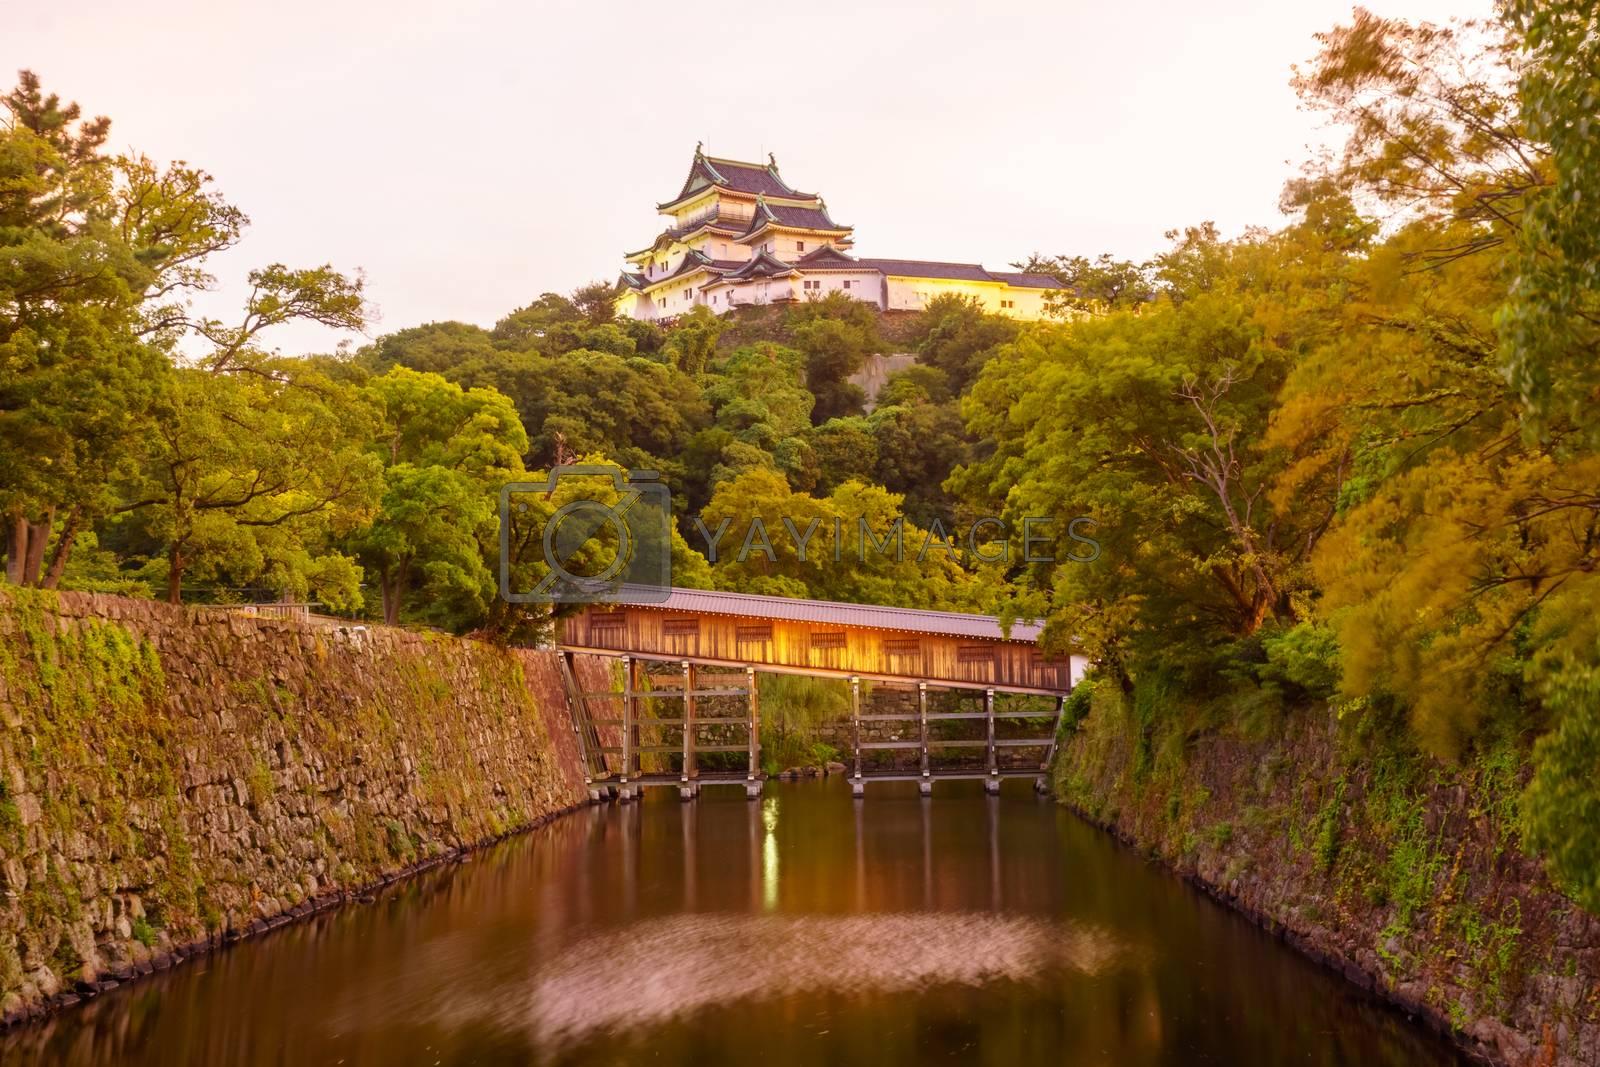 Sunset view of the Wakayama castle and the Ohashirouka Covered Bridge, in Wakayama City, Japan